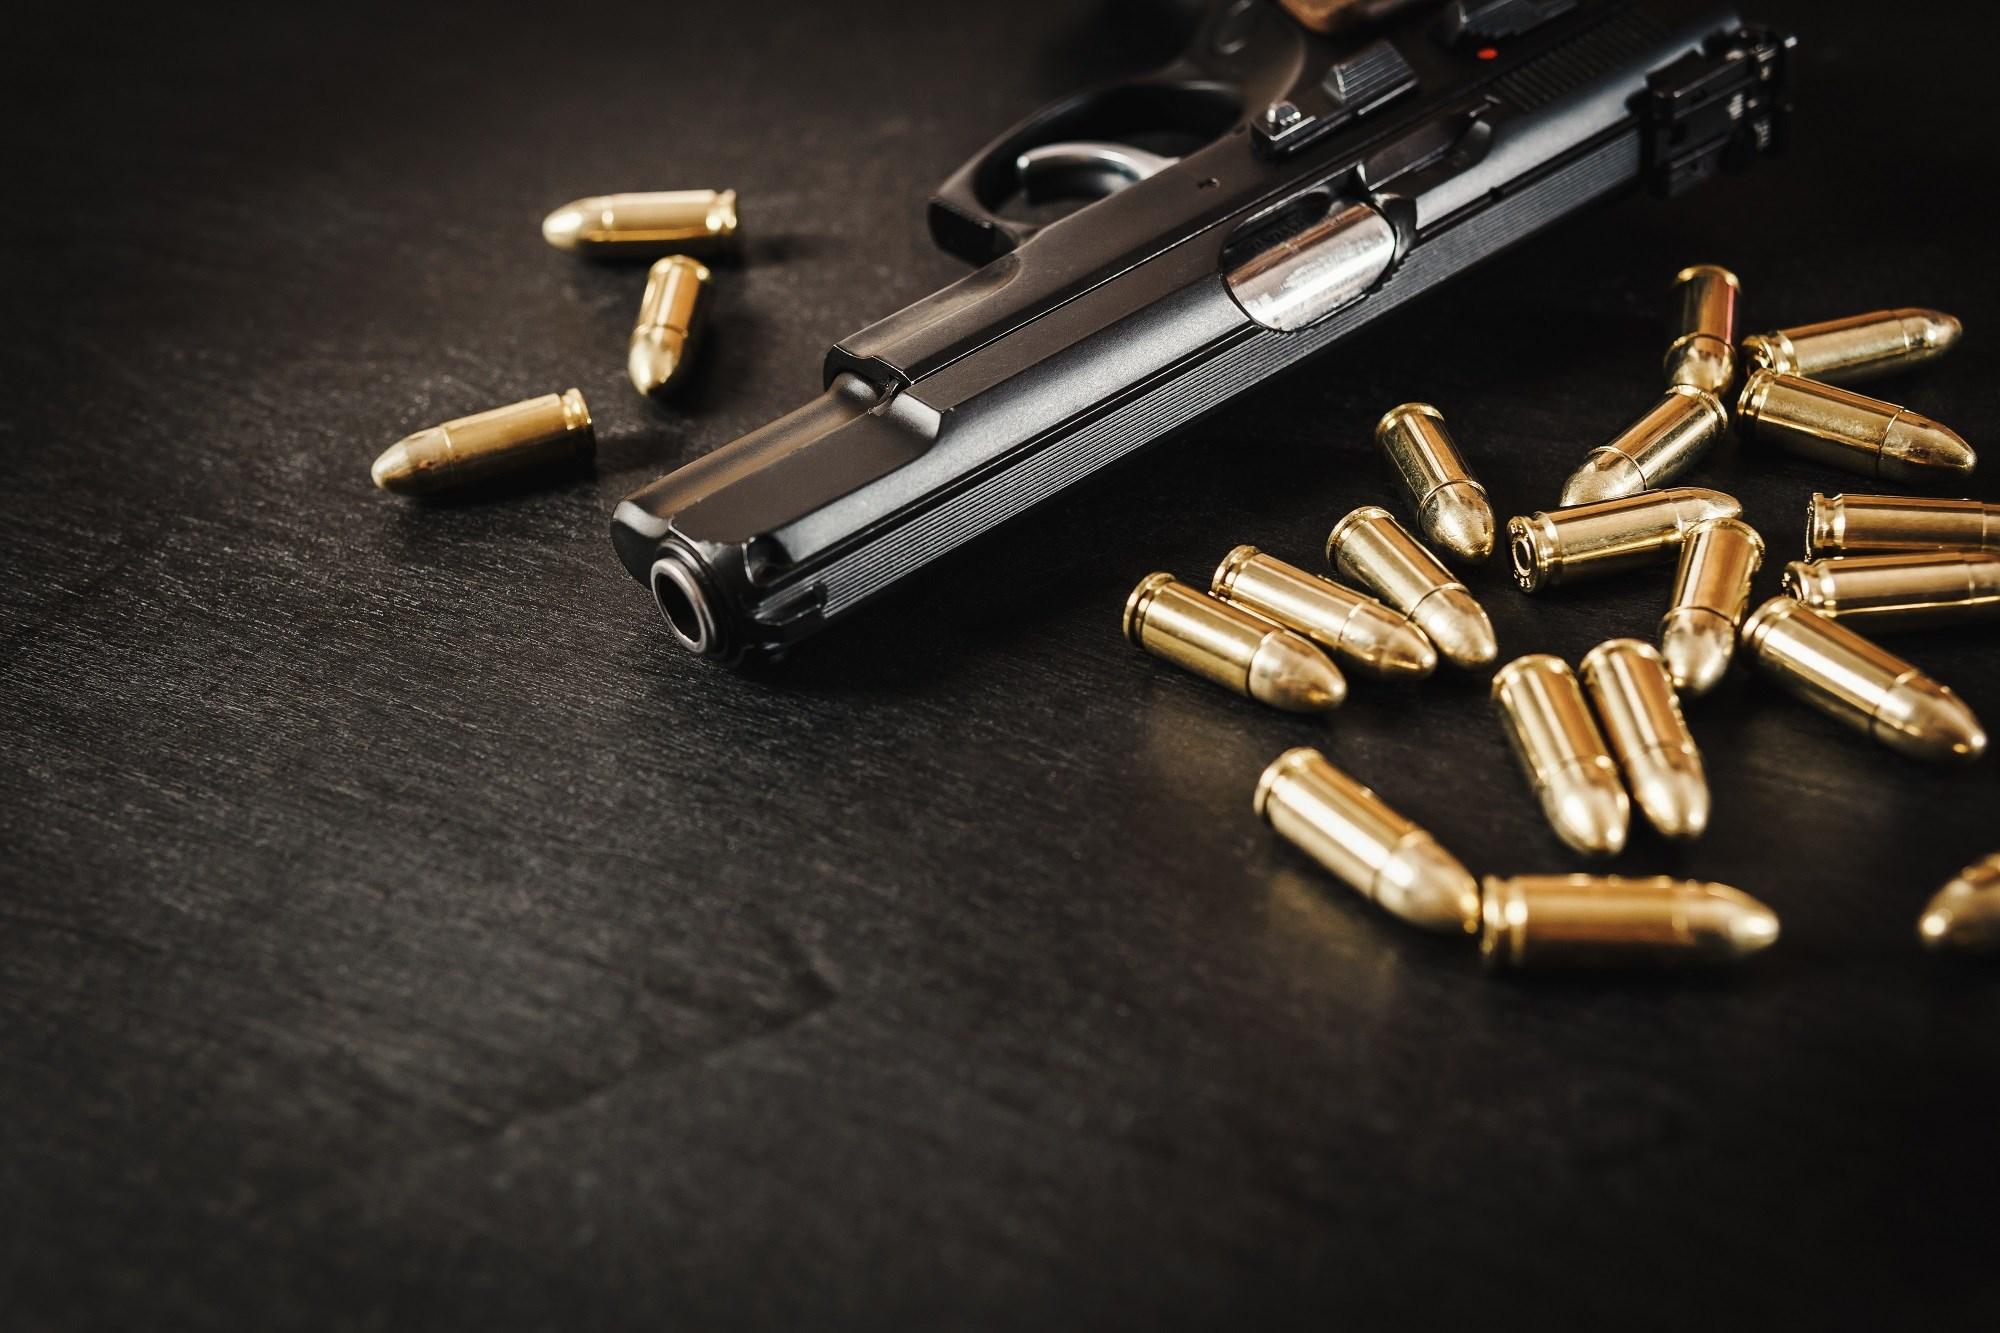 Police Killings of Unarmed Blacks Affect Community Mental Health